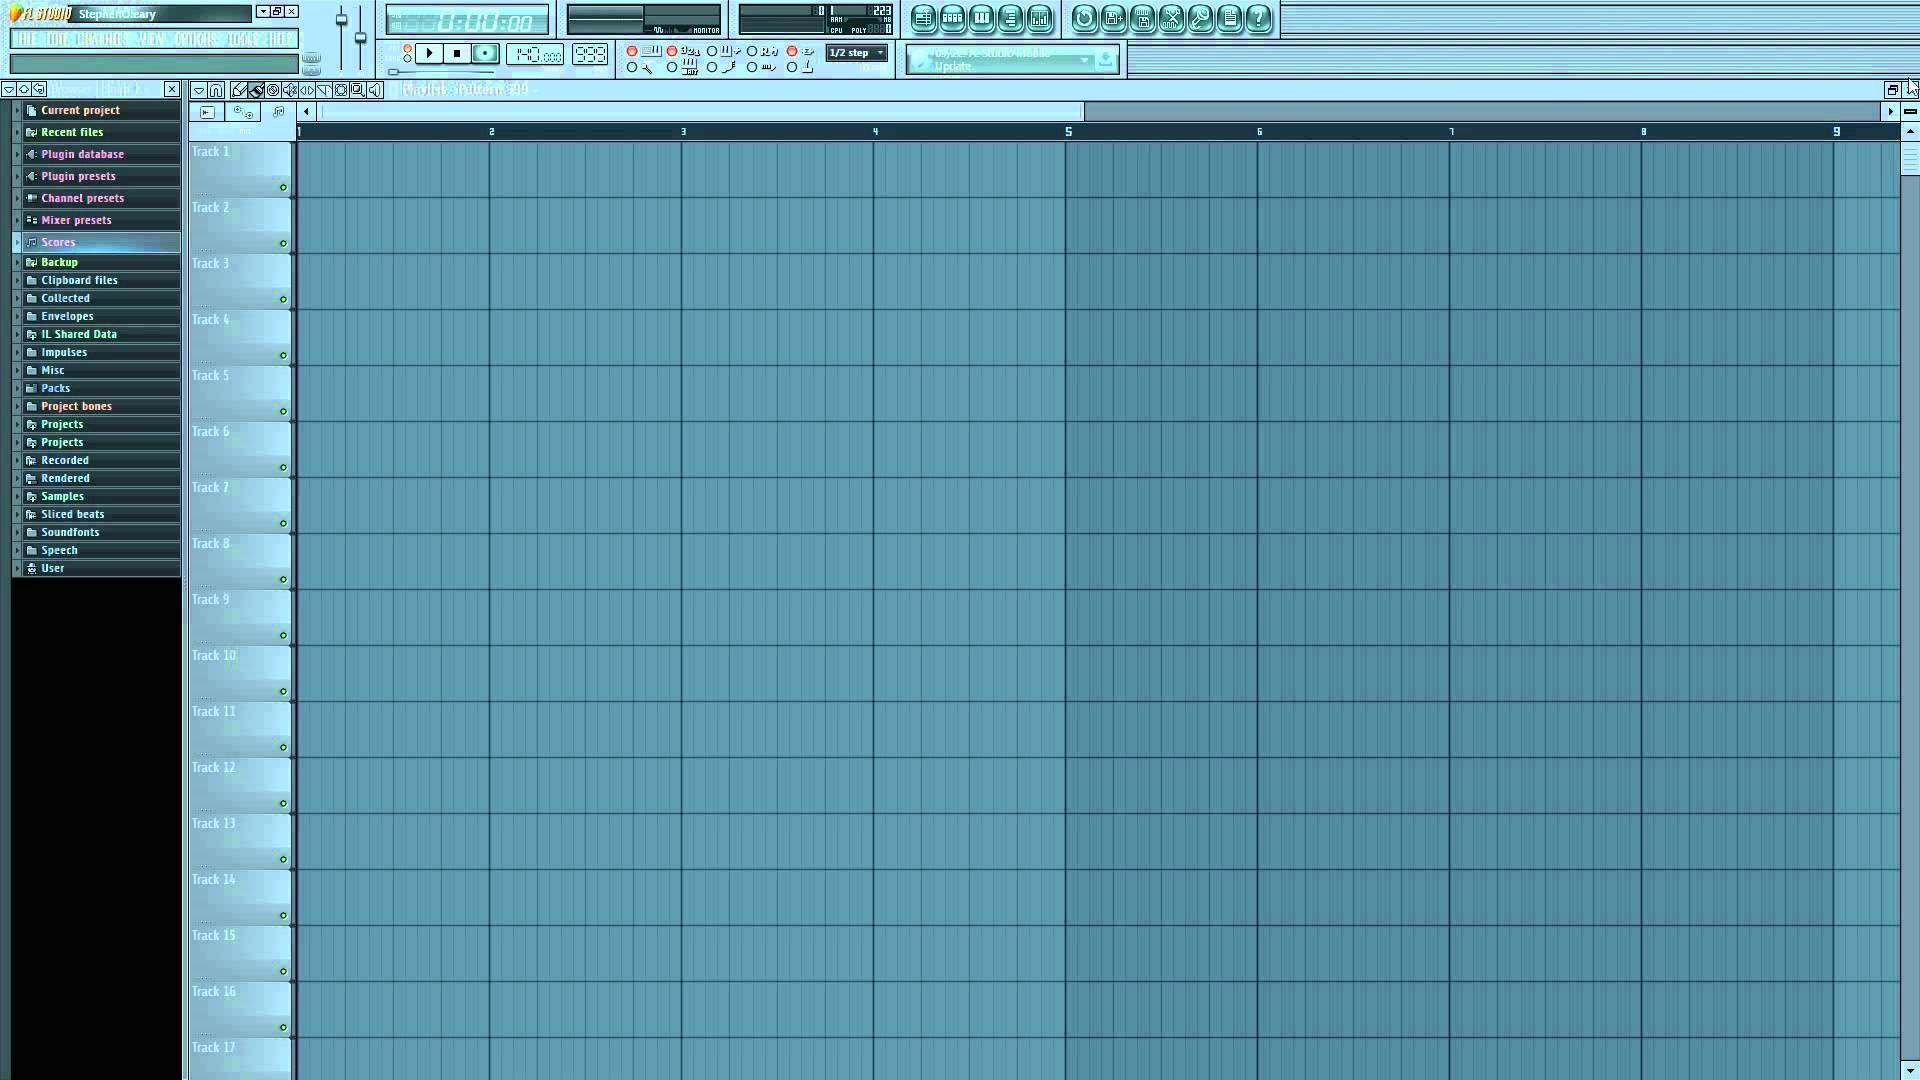 FL Studio 11 Beginners Level 1 Tutorial 3 - Creating a Drum Beat